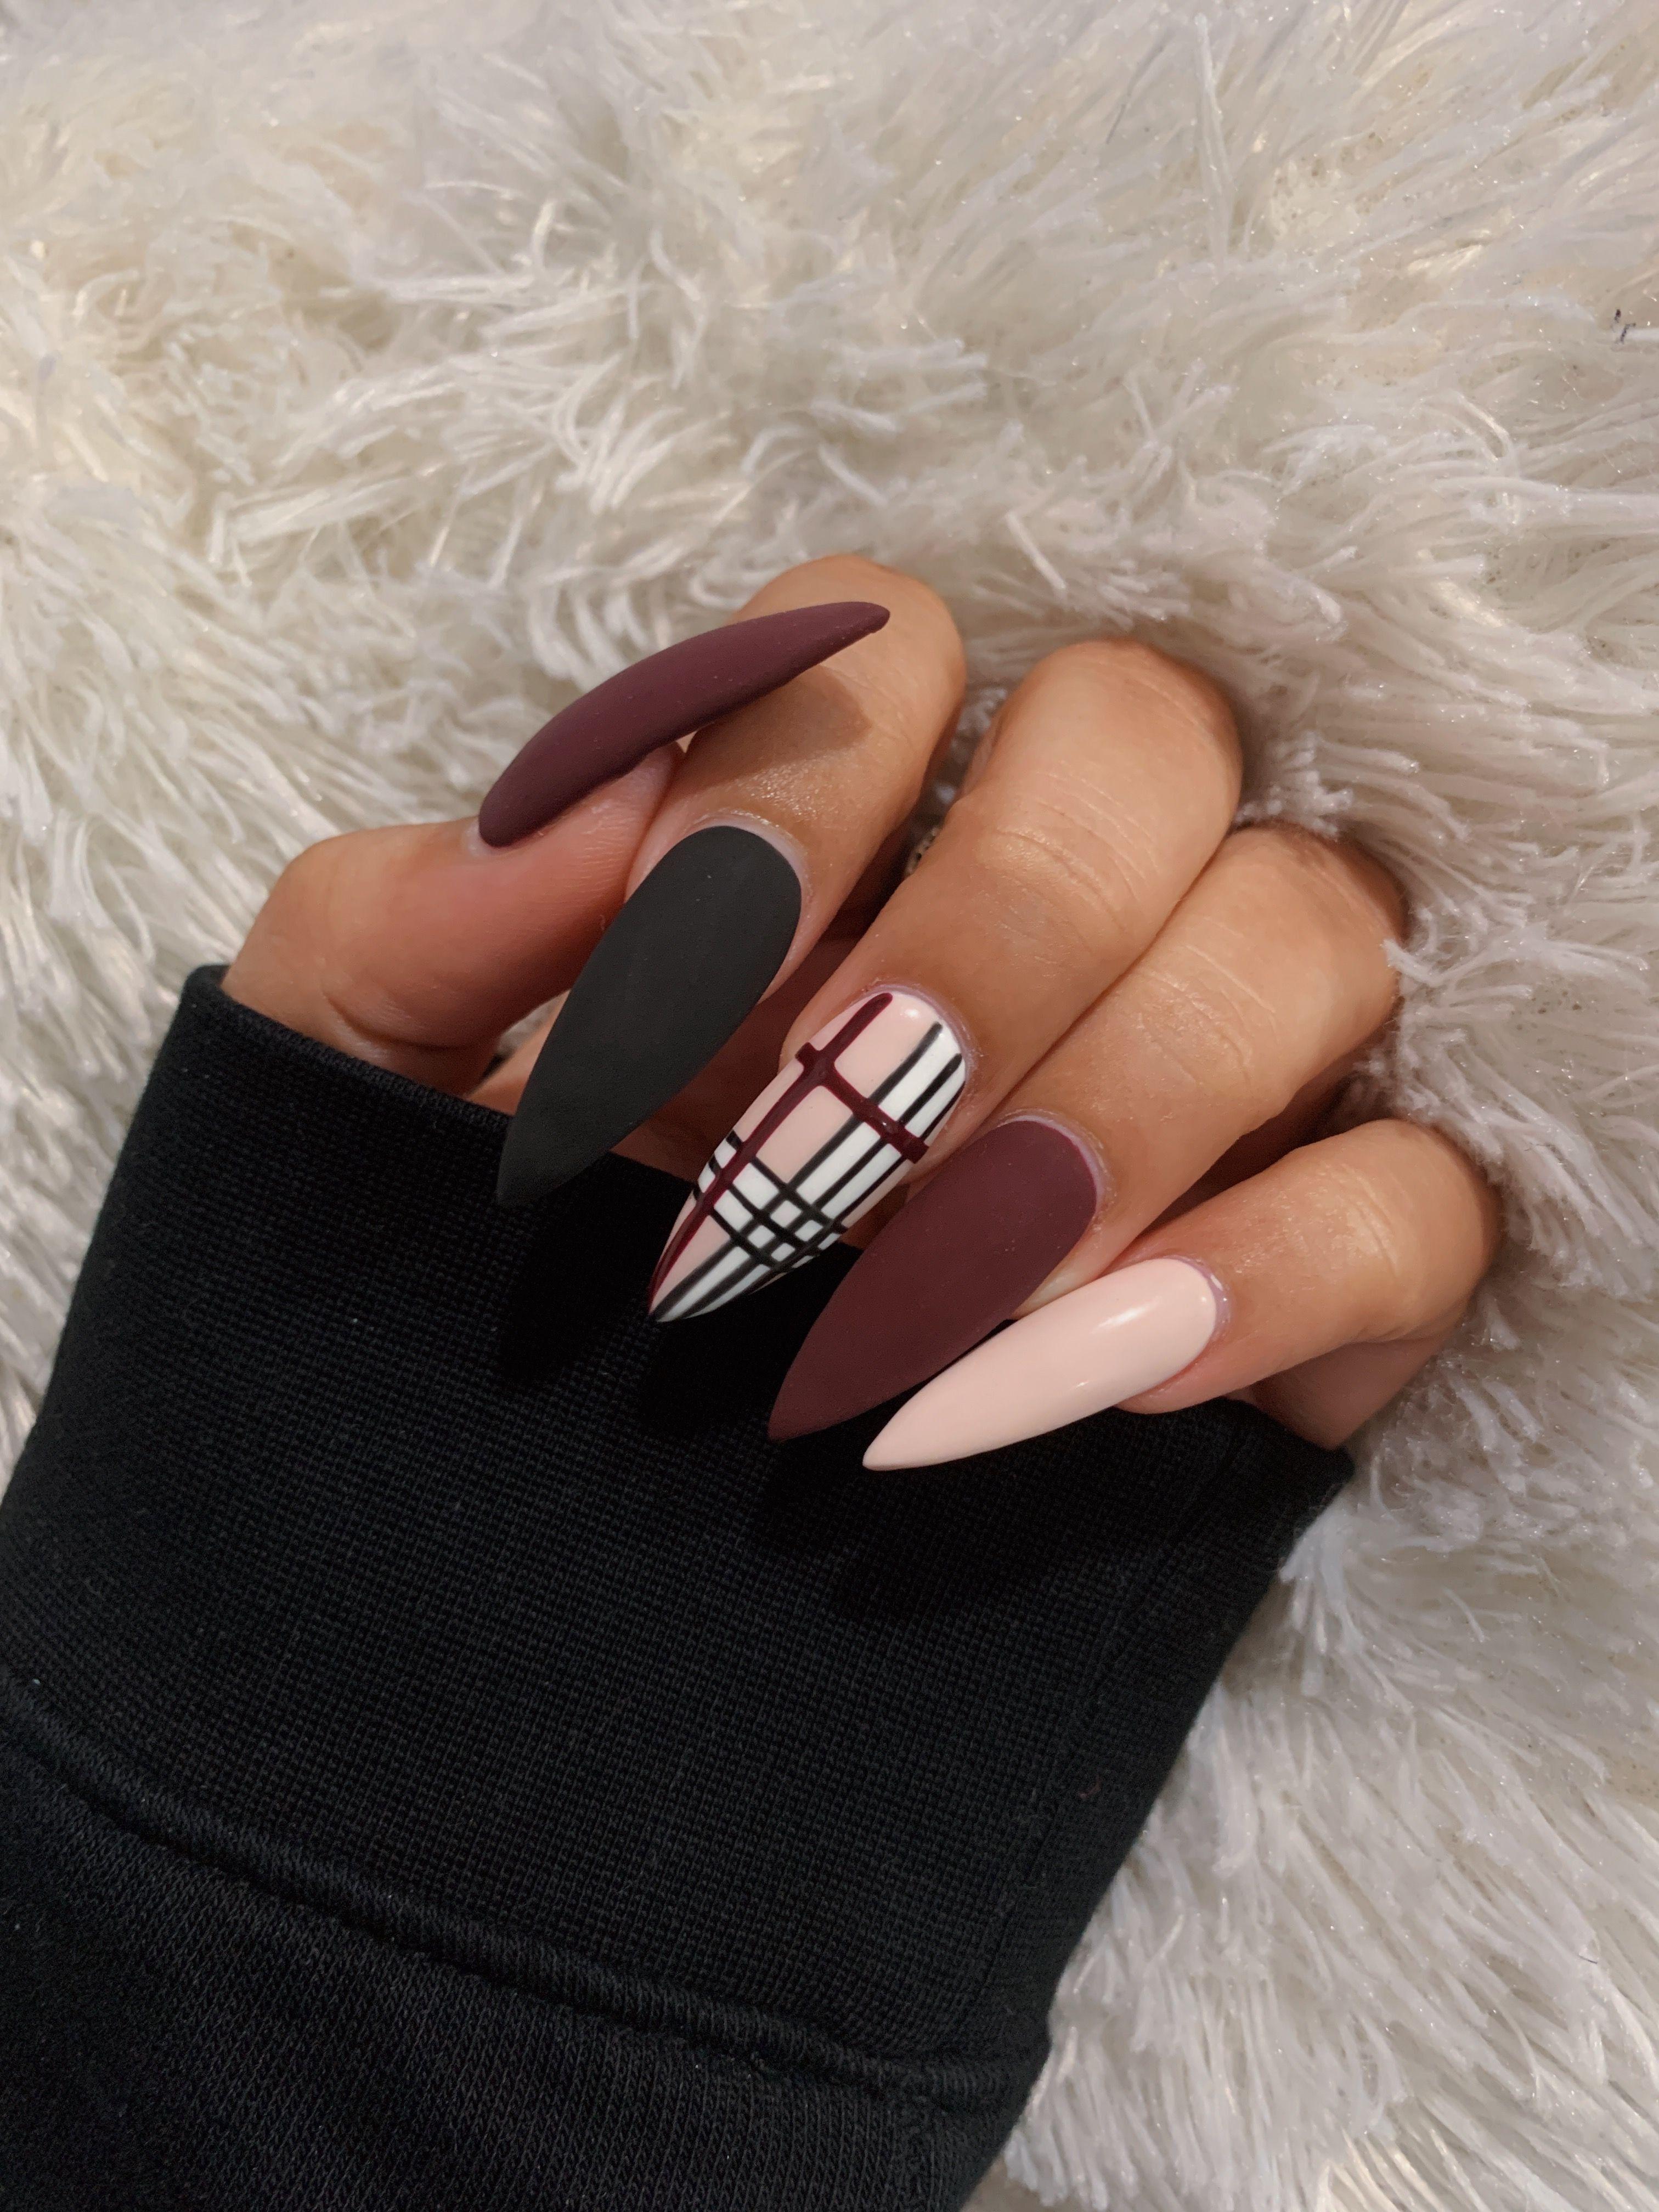 Amazon.com: acrylic nail designs for fall - Free S